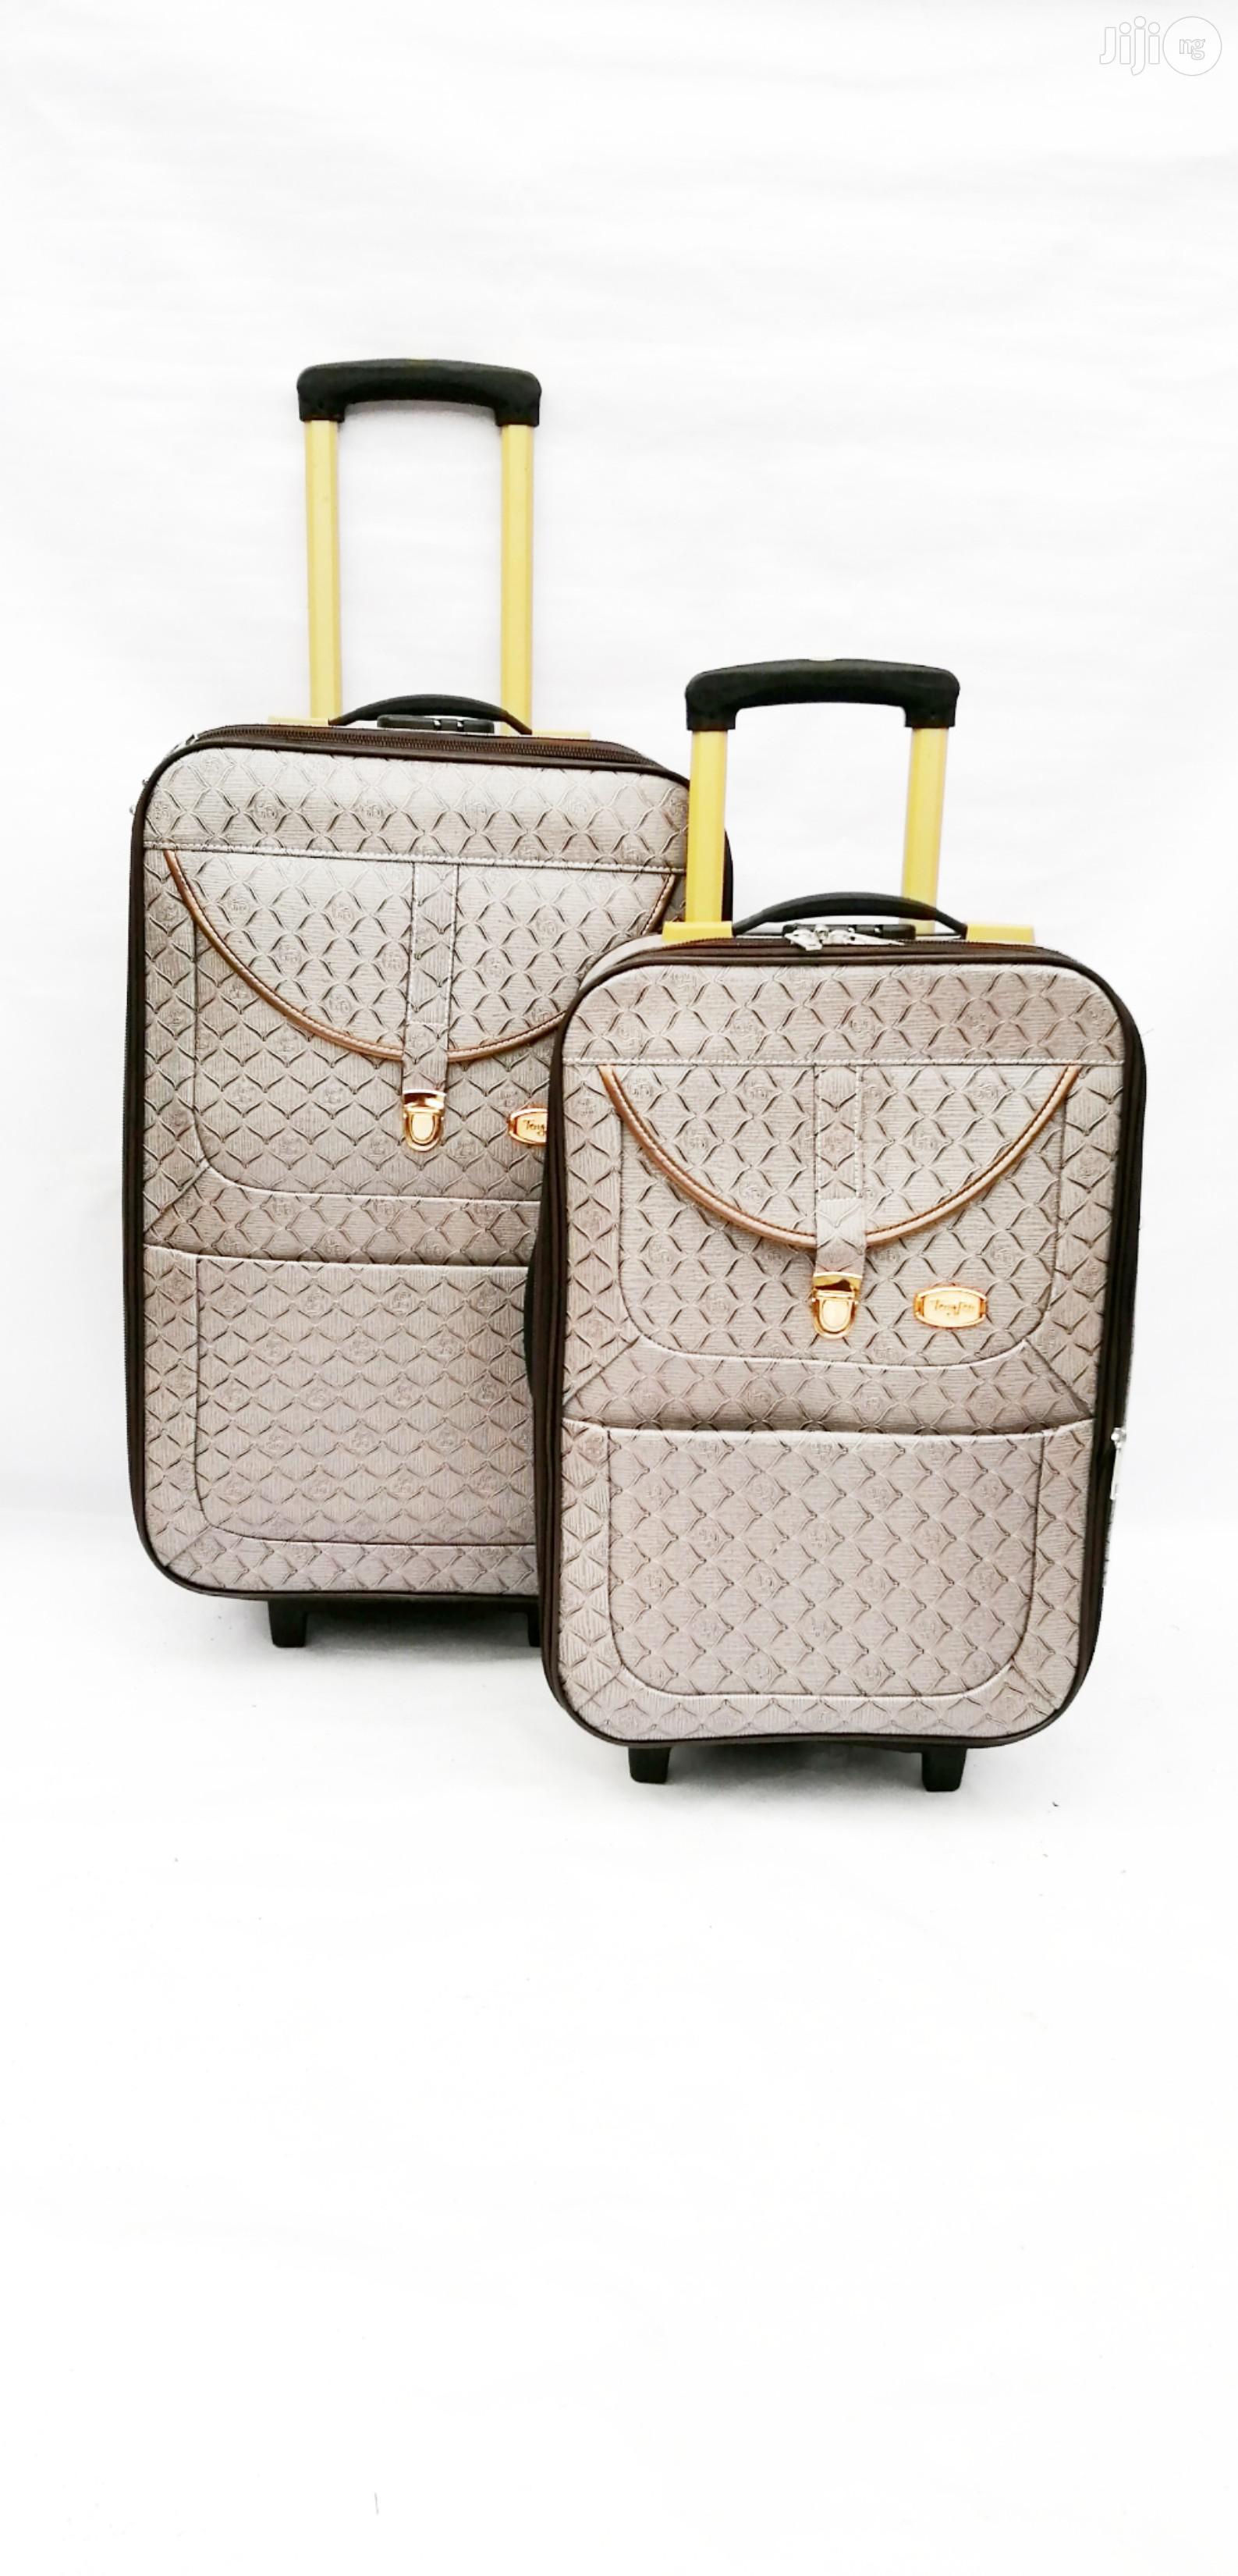 2 Wheel Luggage Set for Travel Storage